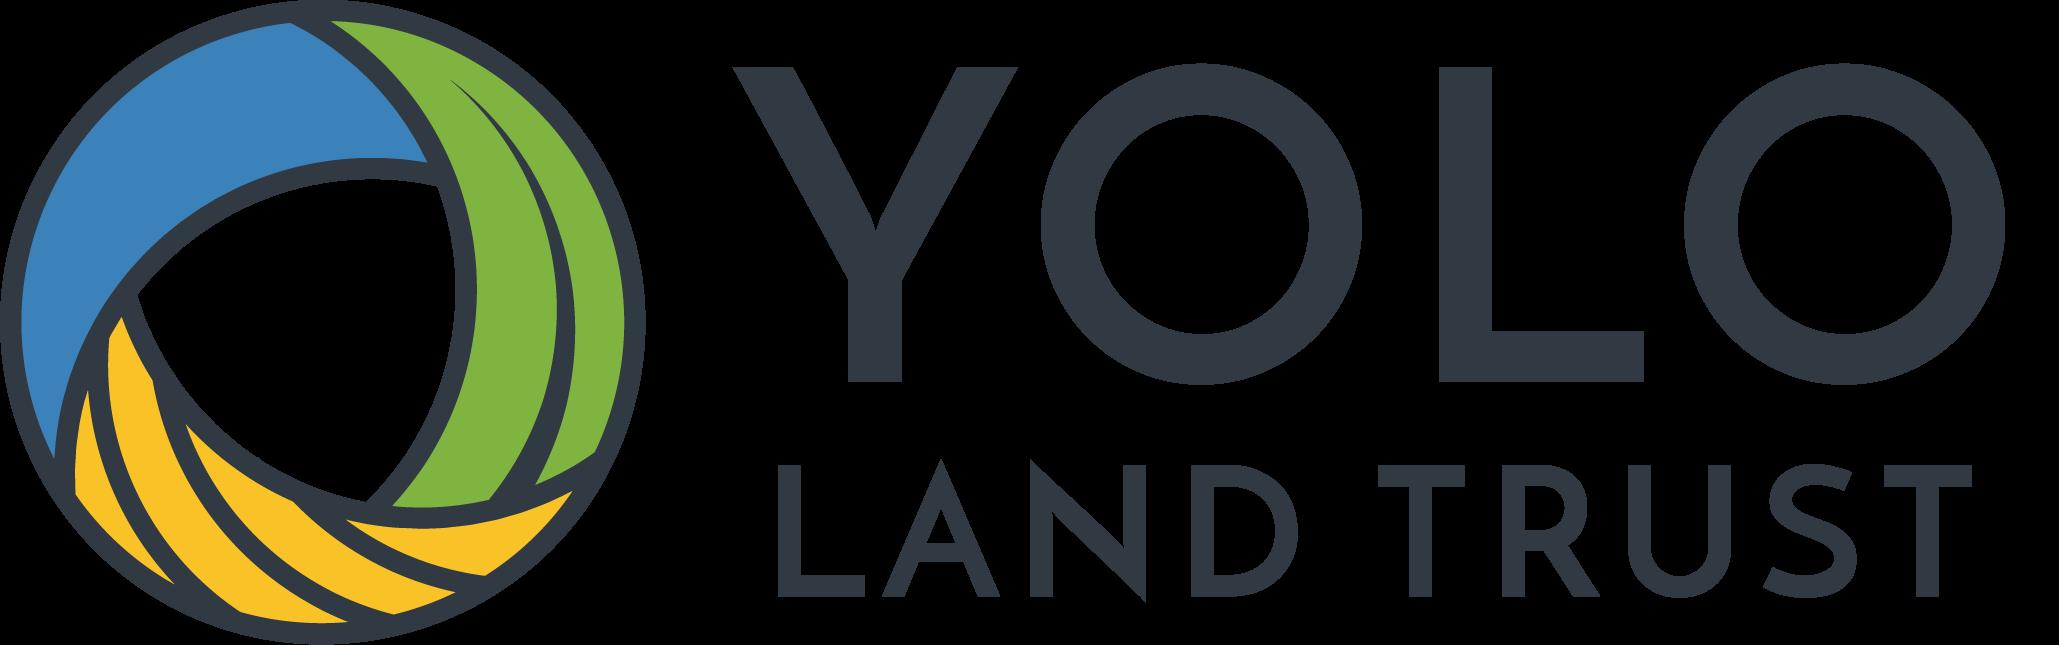 Yolo Land Trust Logo Main.png